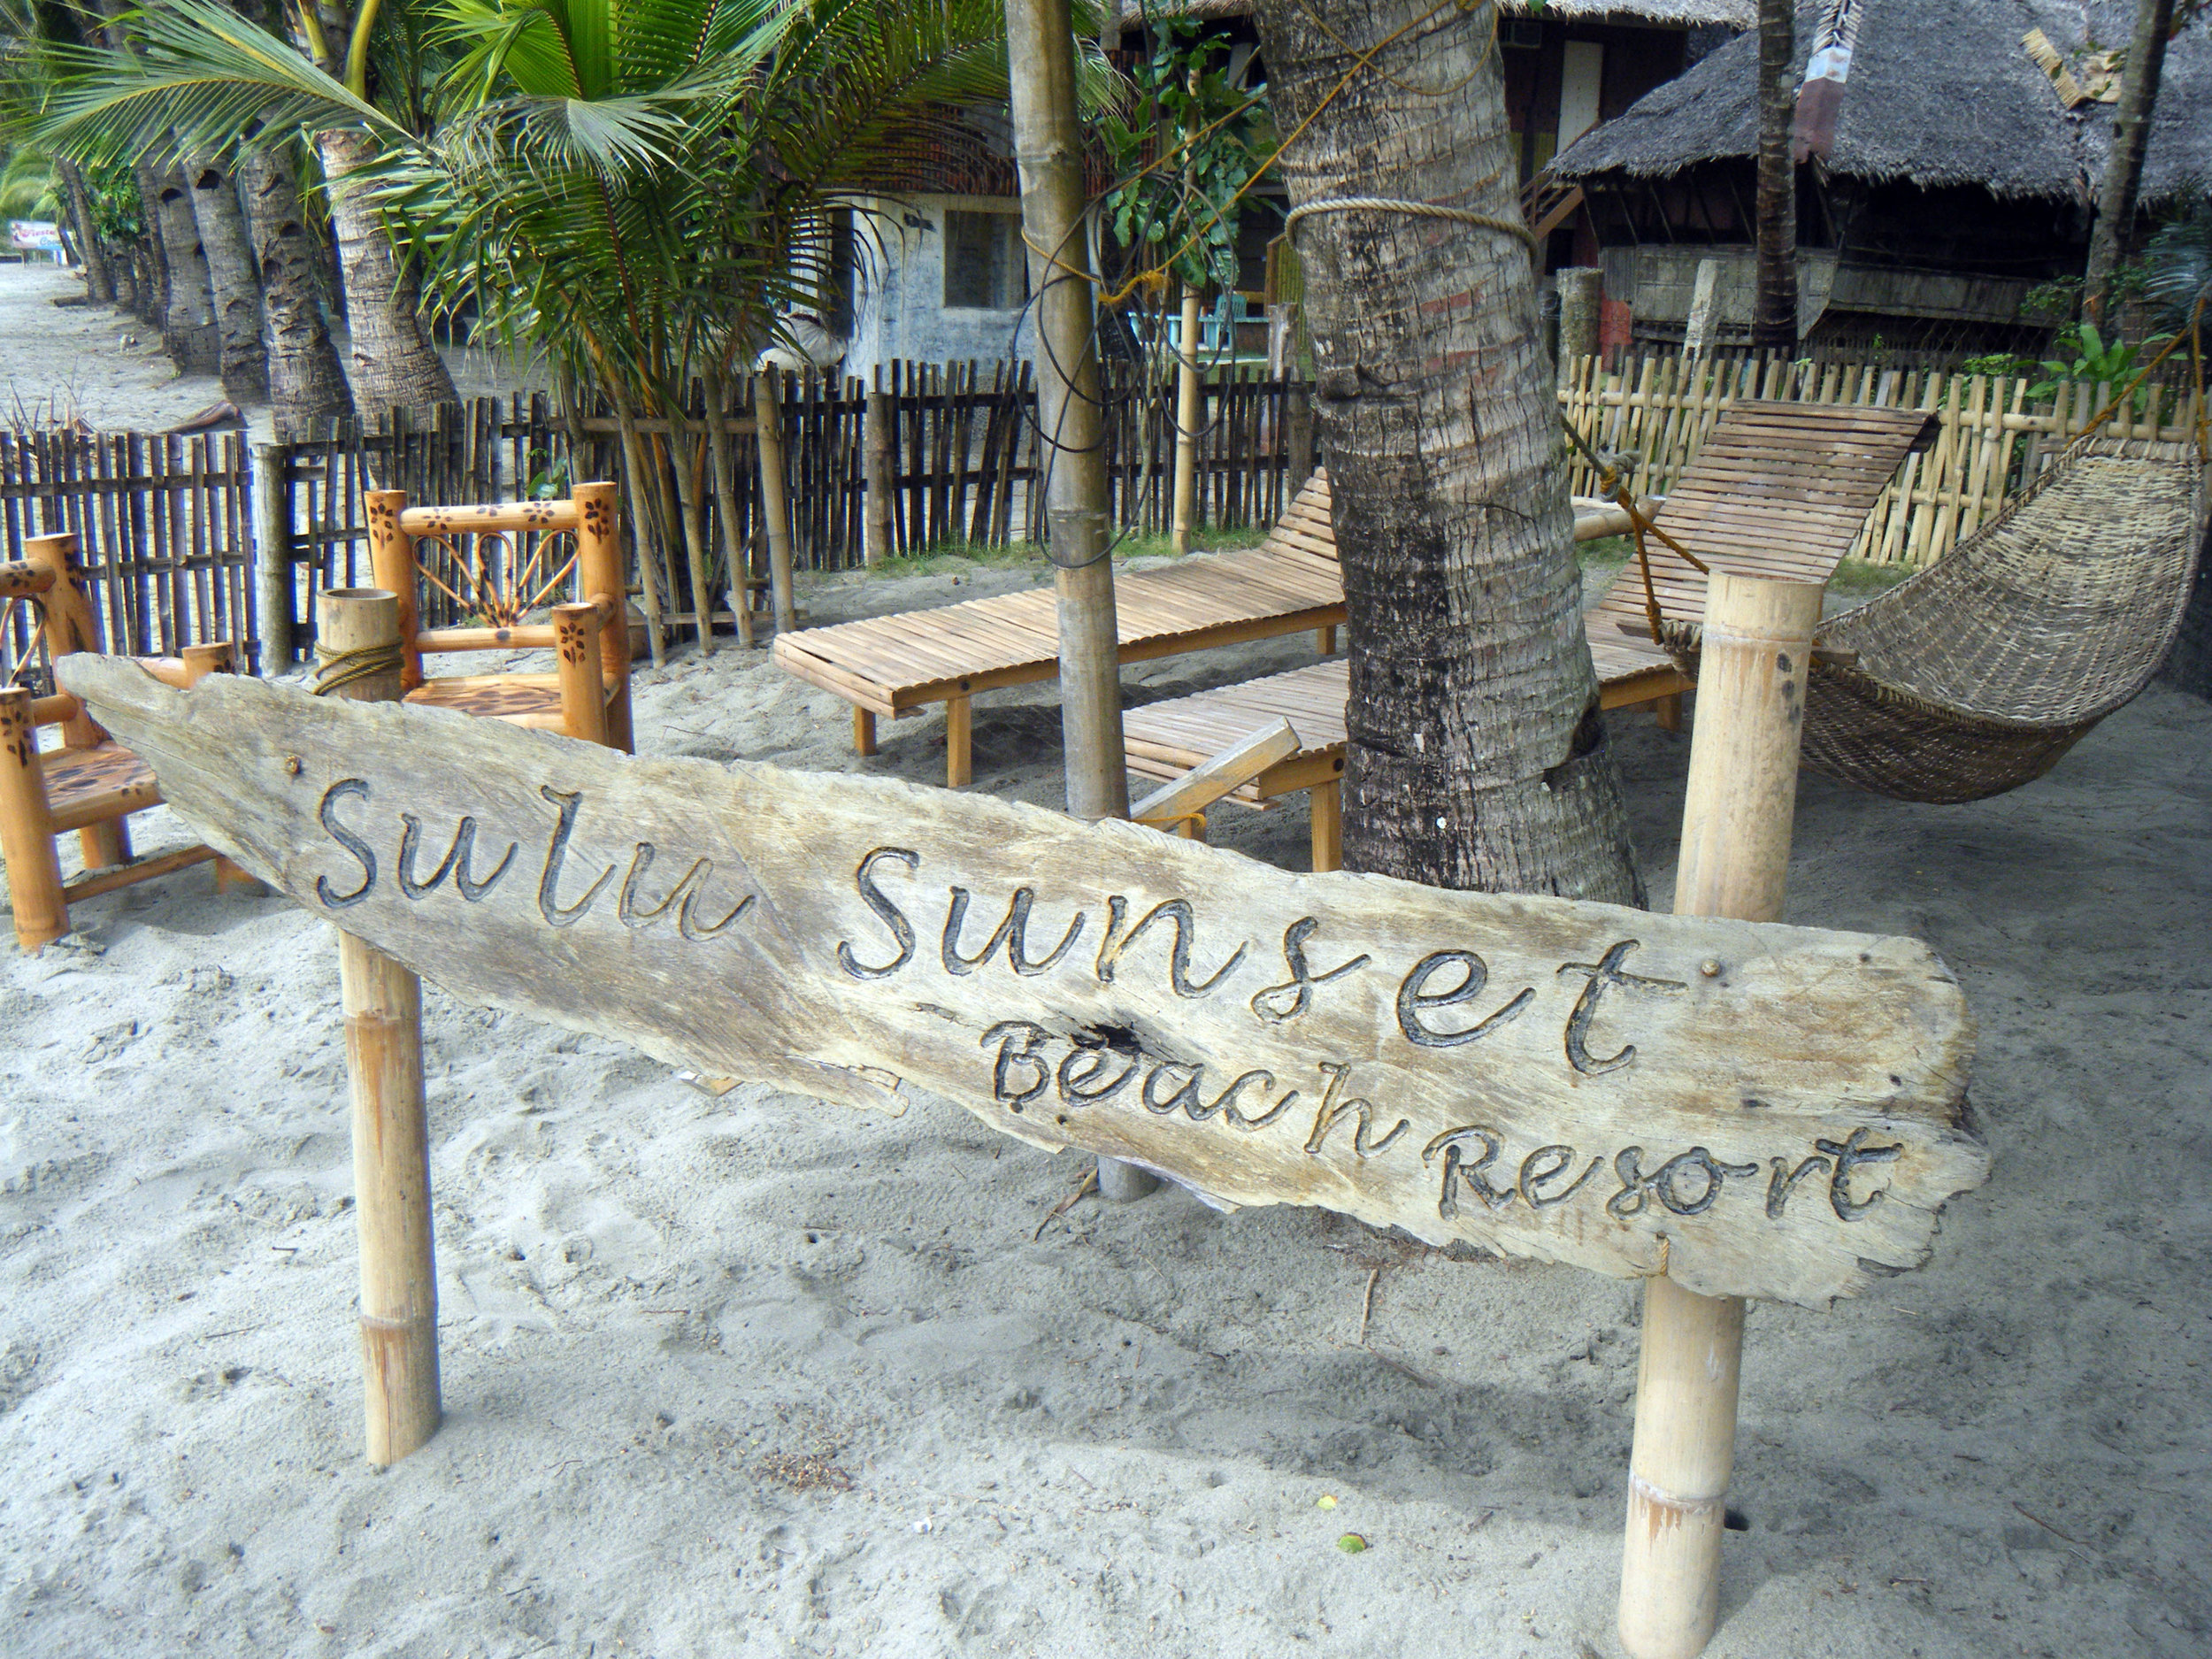 Sulu Sunset Beach Resort.jpg